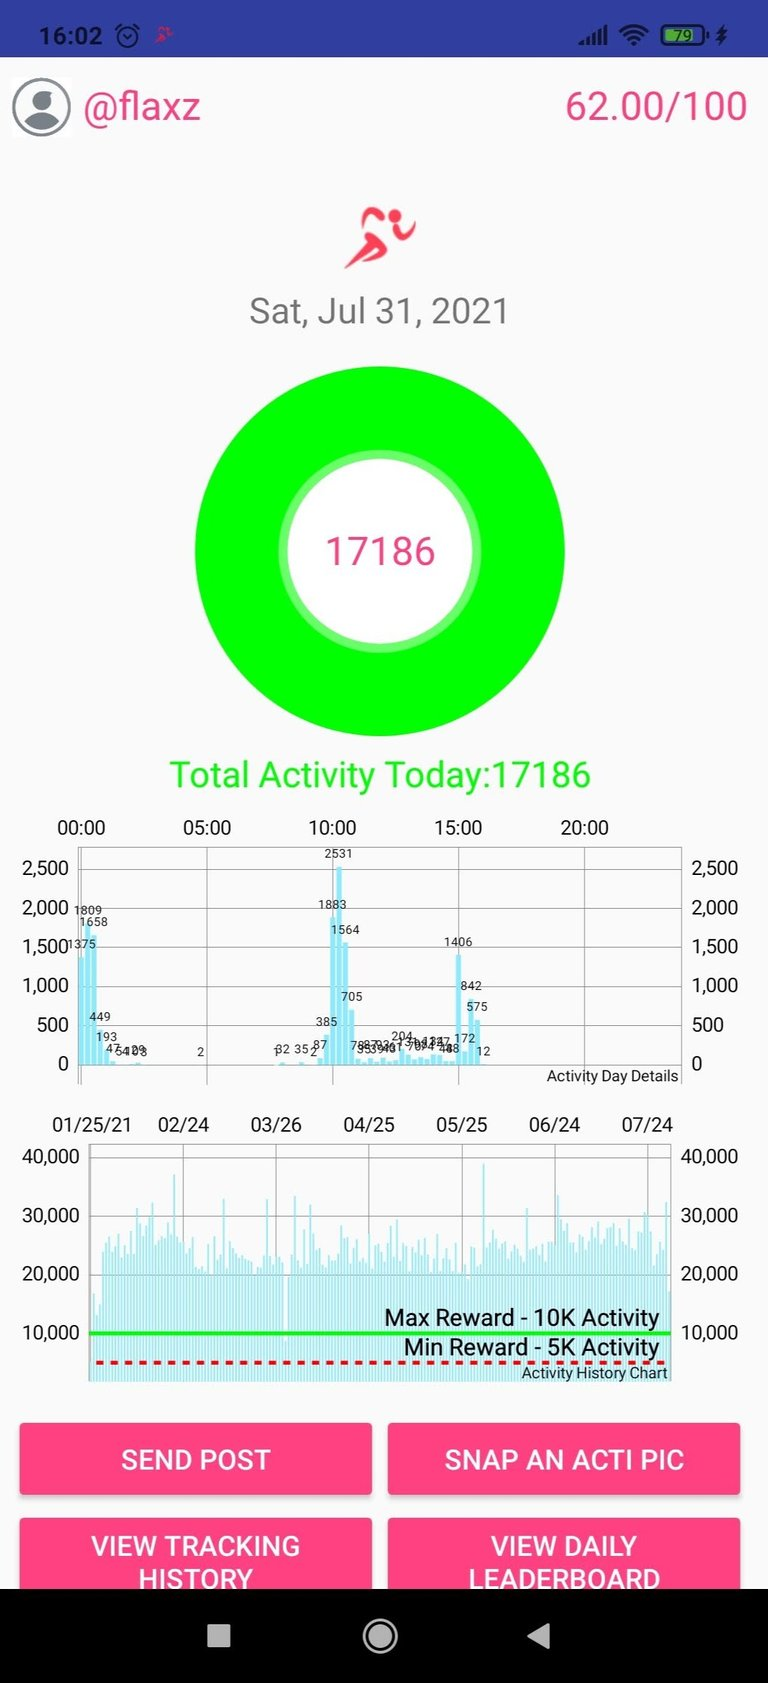 Screenshot_2021-07-31-16-02-03-848_io.actifit.fitnesstracker.actifitfitnesstracker.jpg